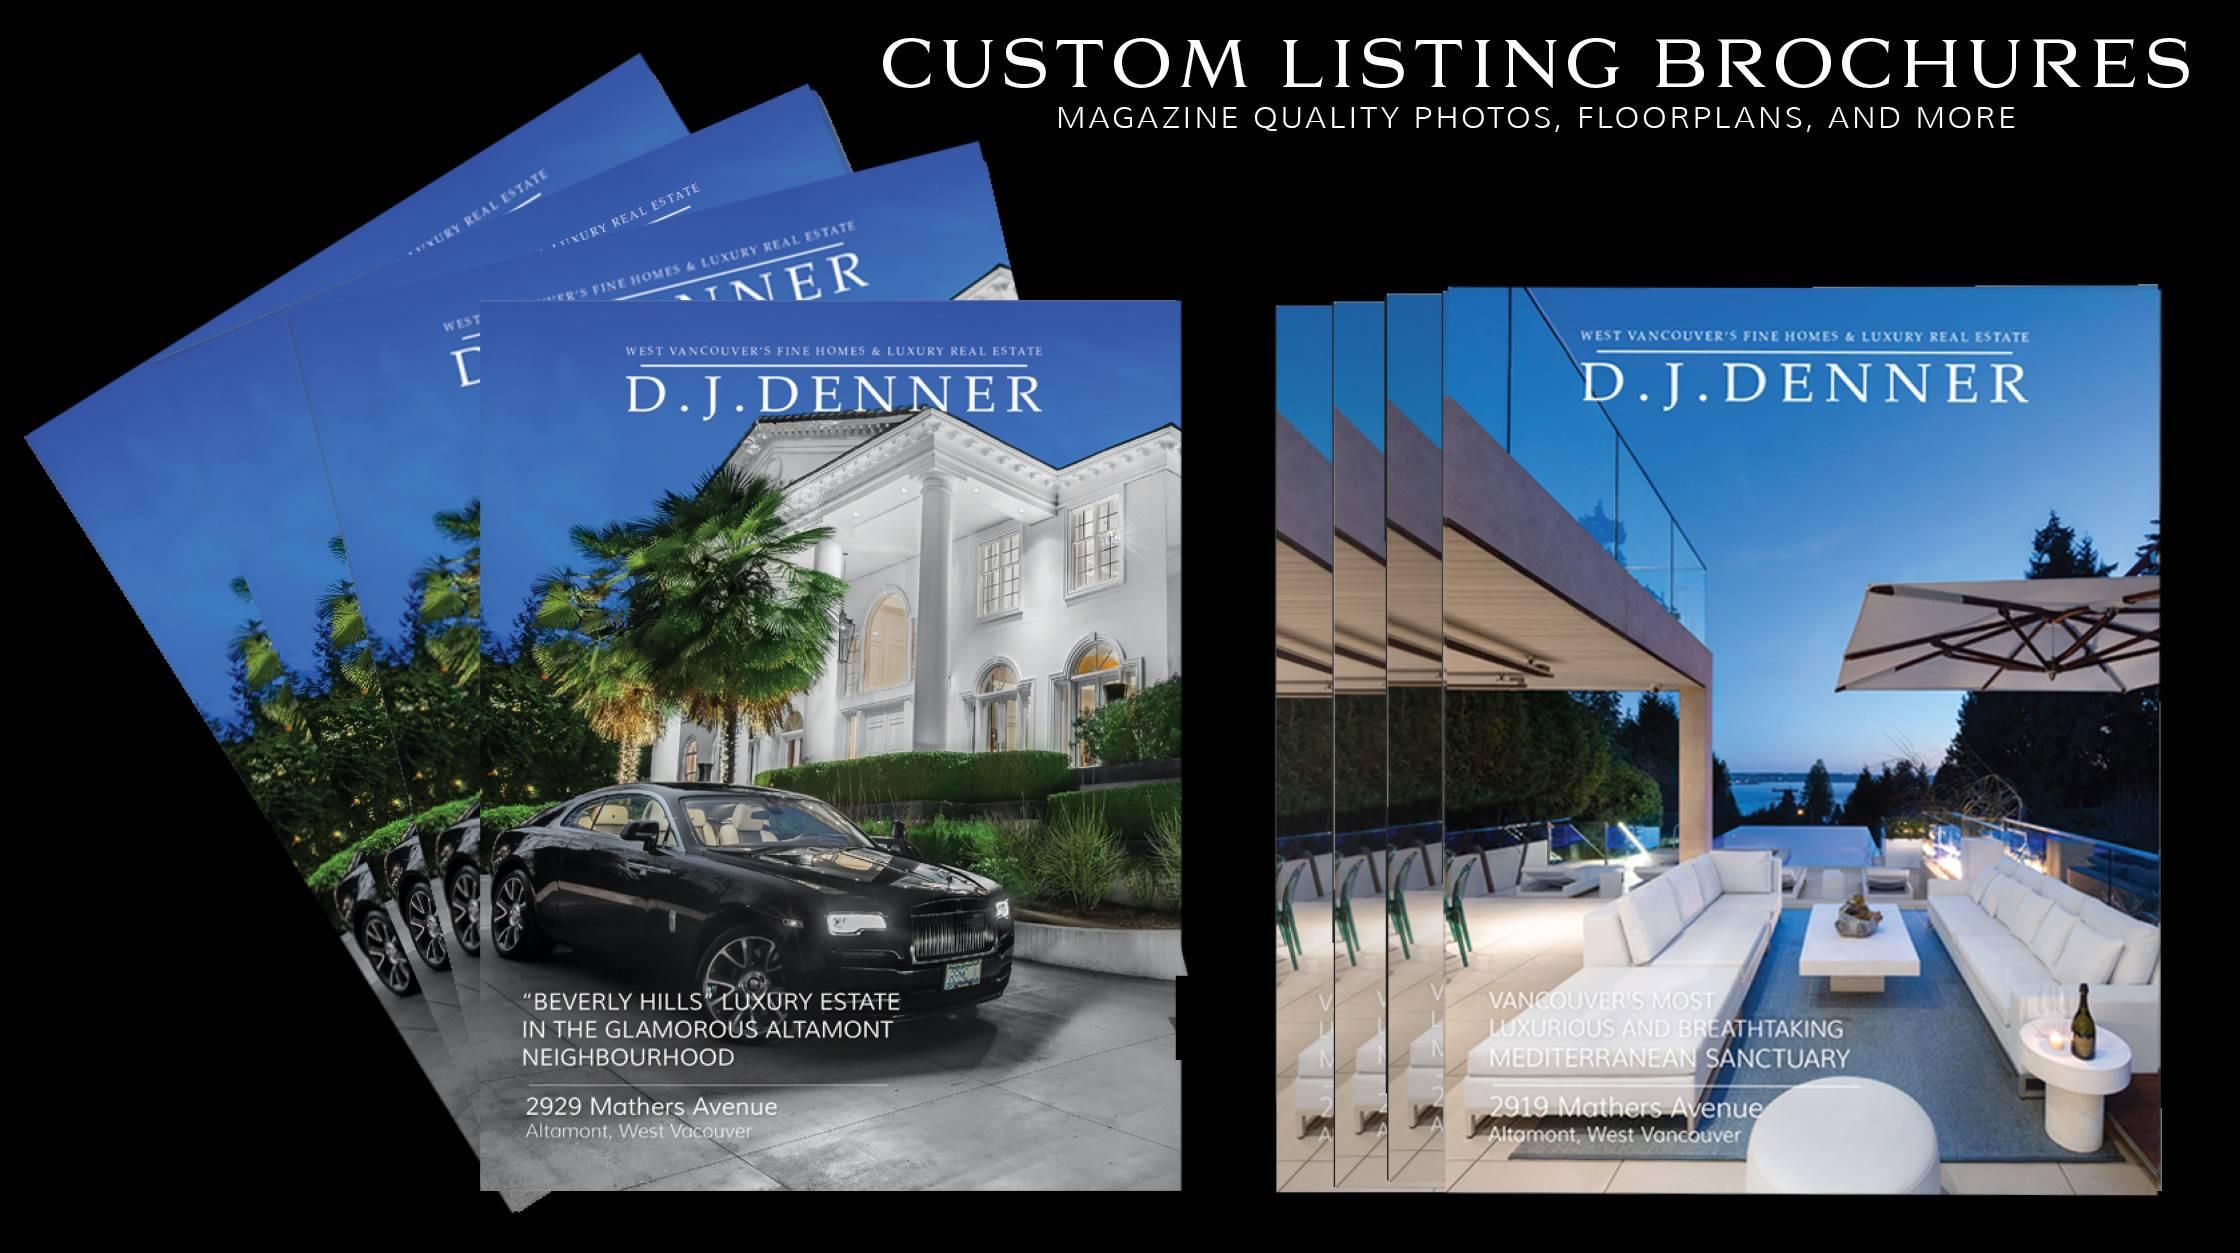 Custom Listing Brochures